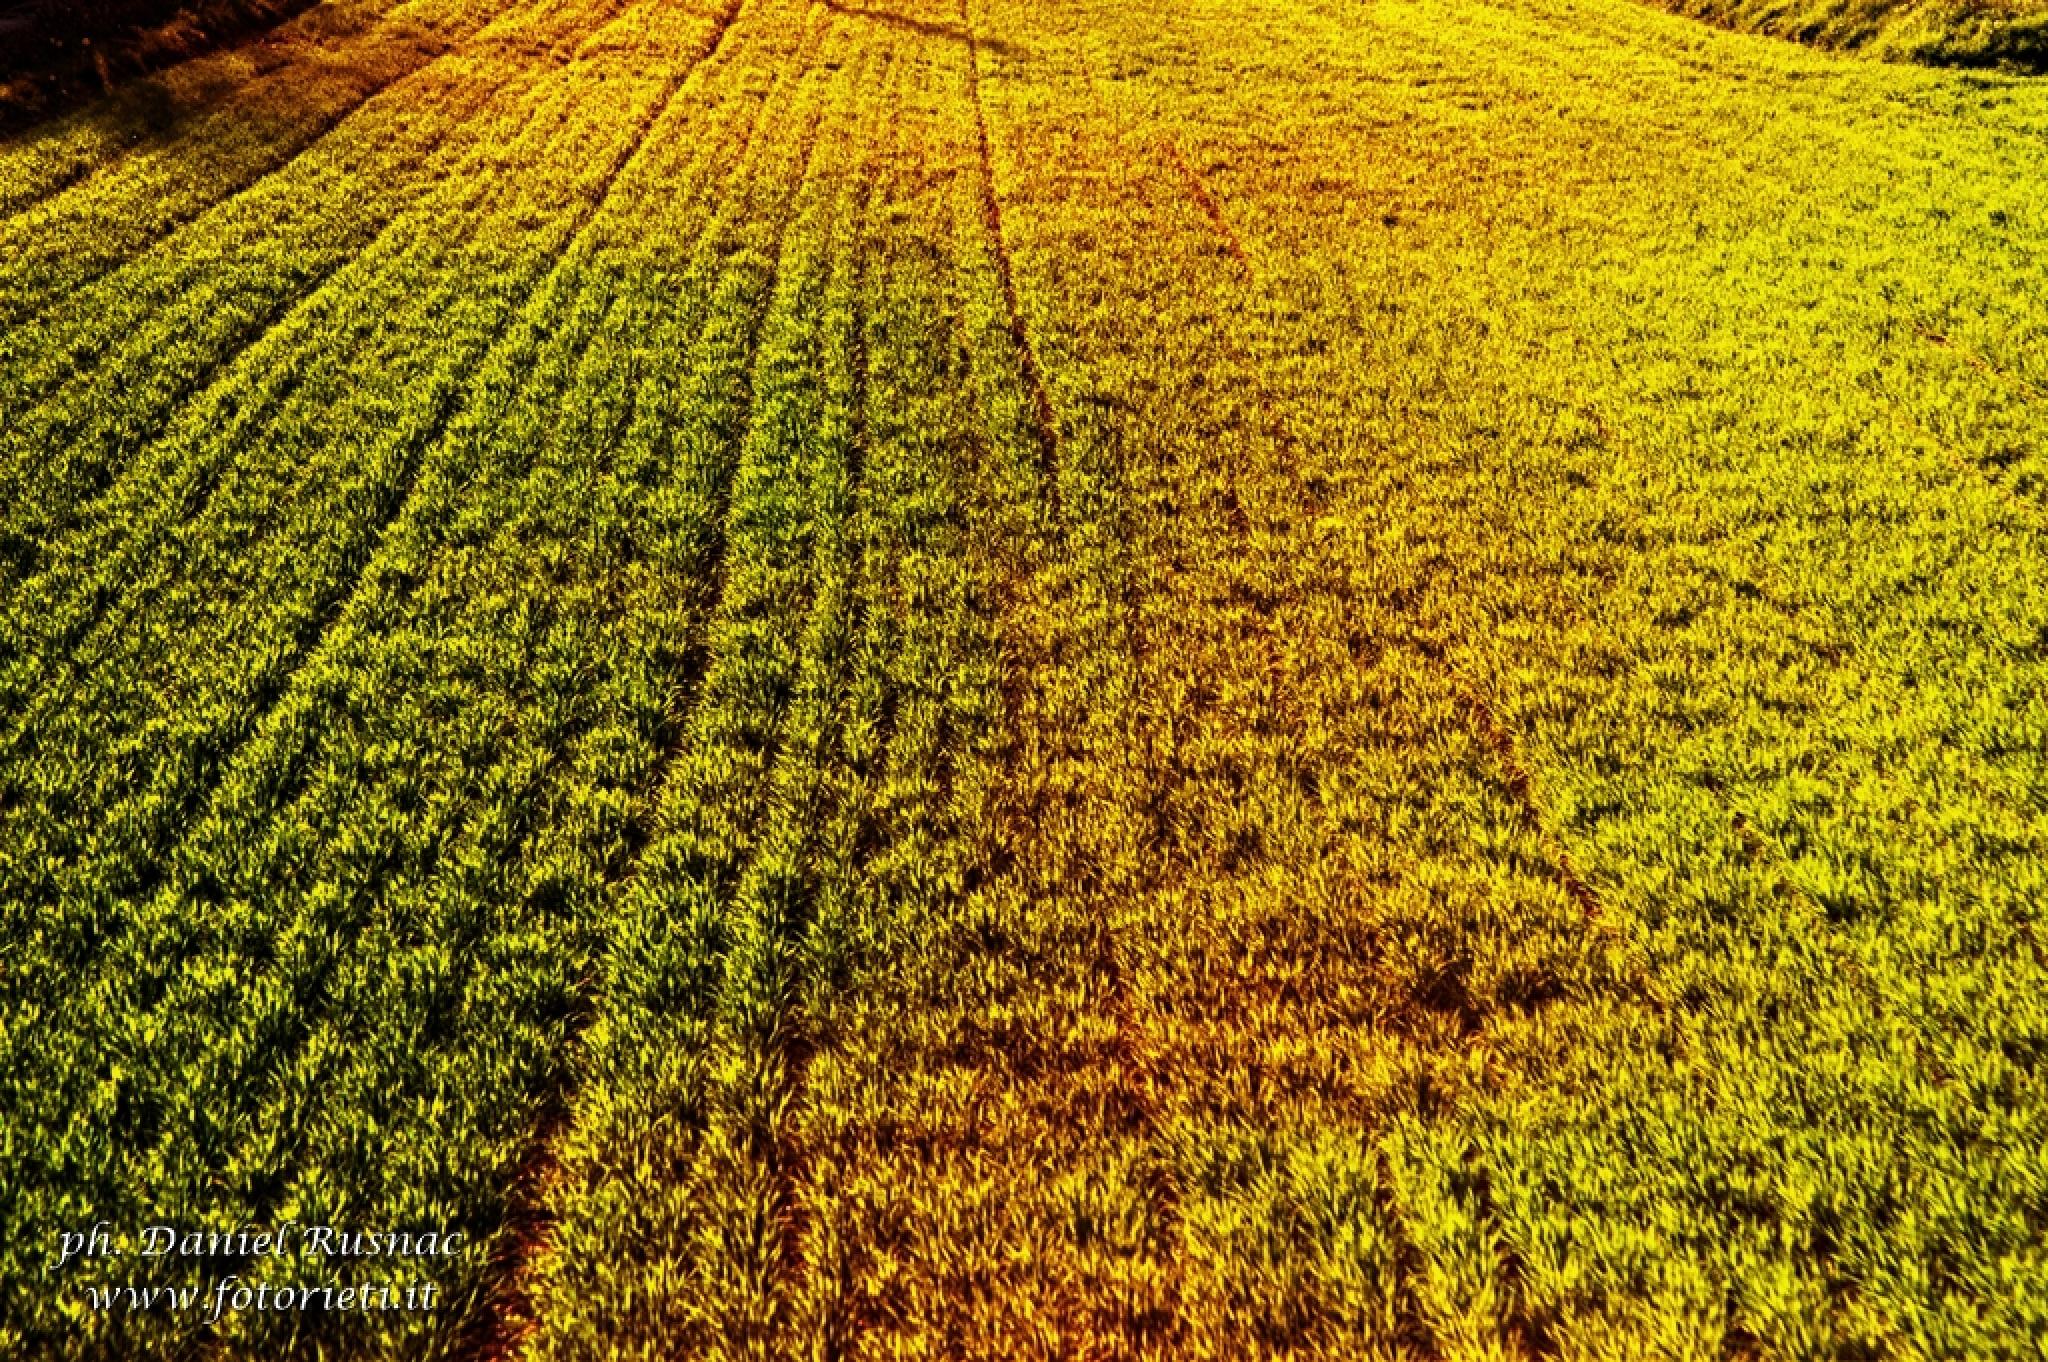 Grass by Daniel Rusnac di Fotorieti